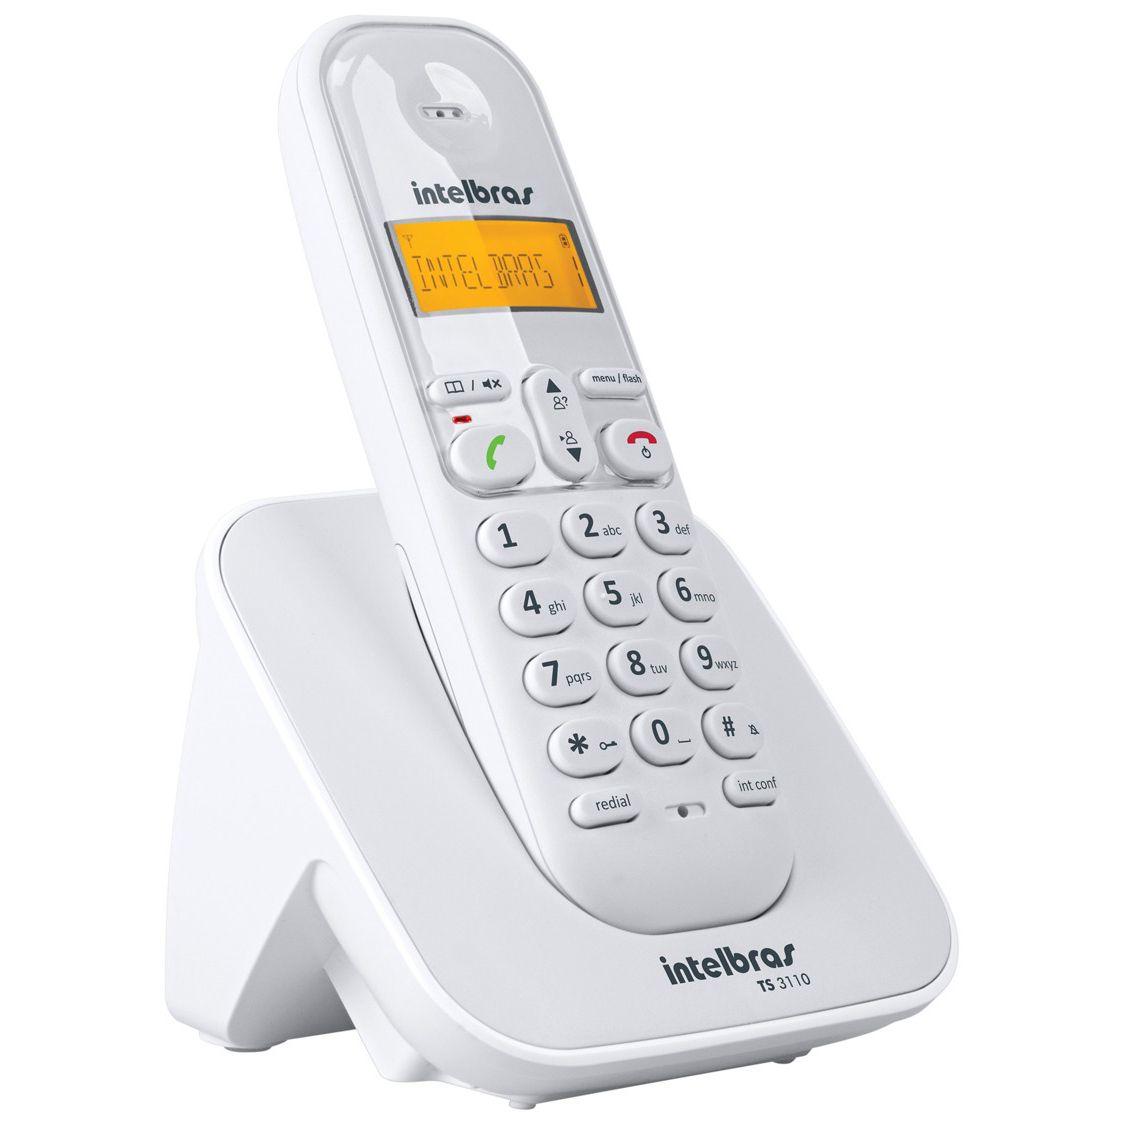 Telefone s/ Fio c/ ID de Chamadas TS 3110 - Intelbras